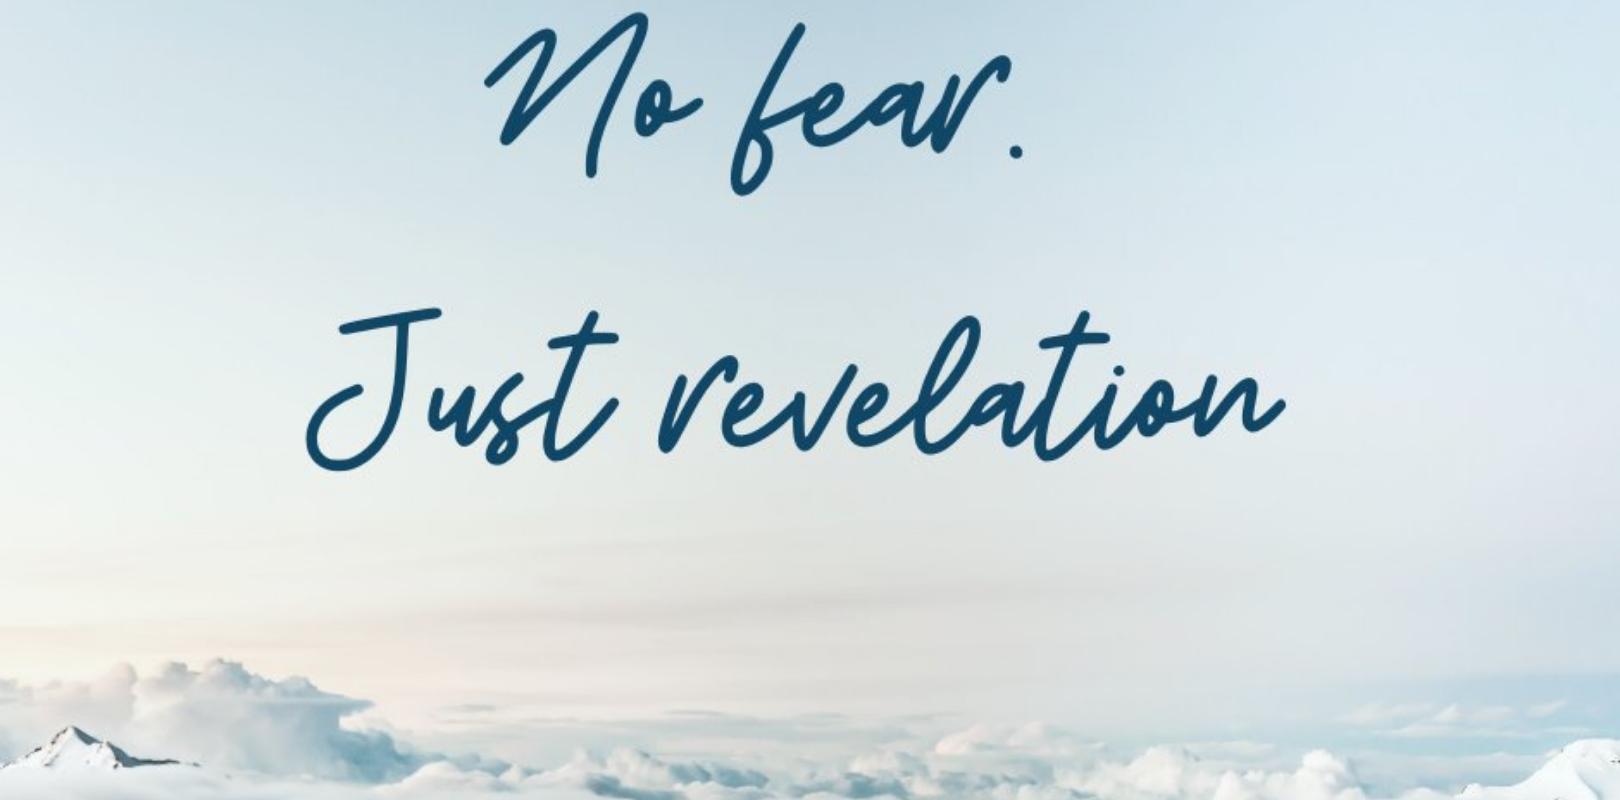 No Fear. Just Revelation.